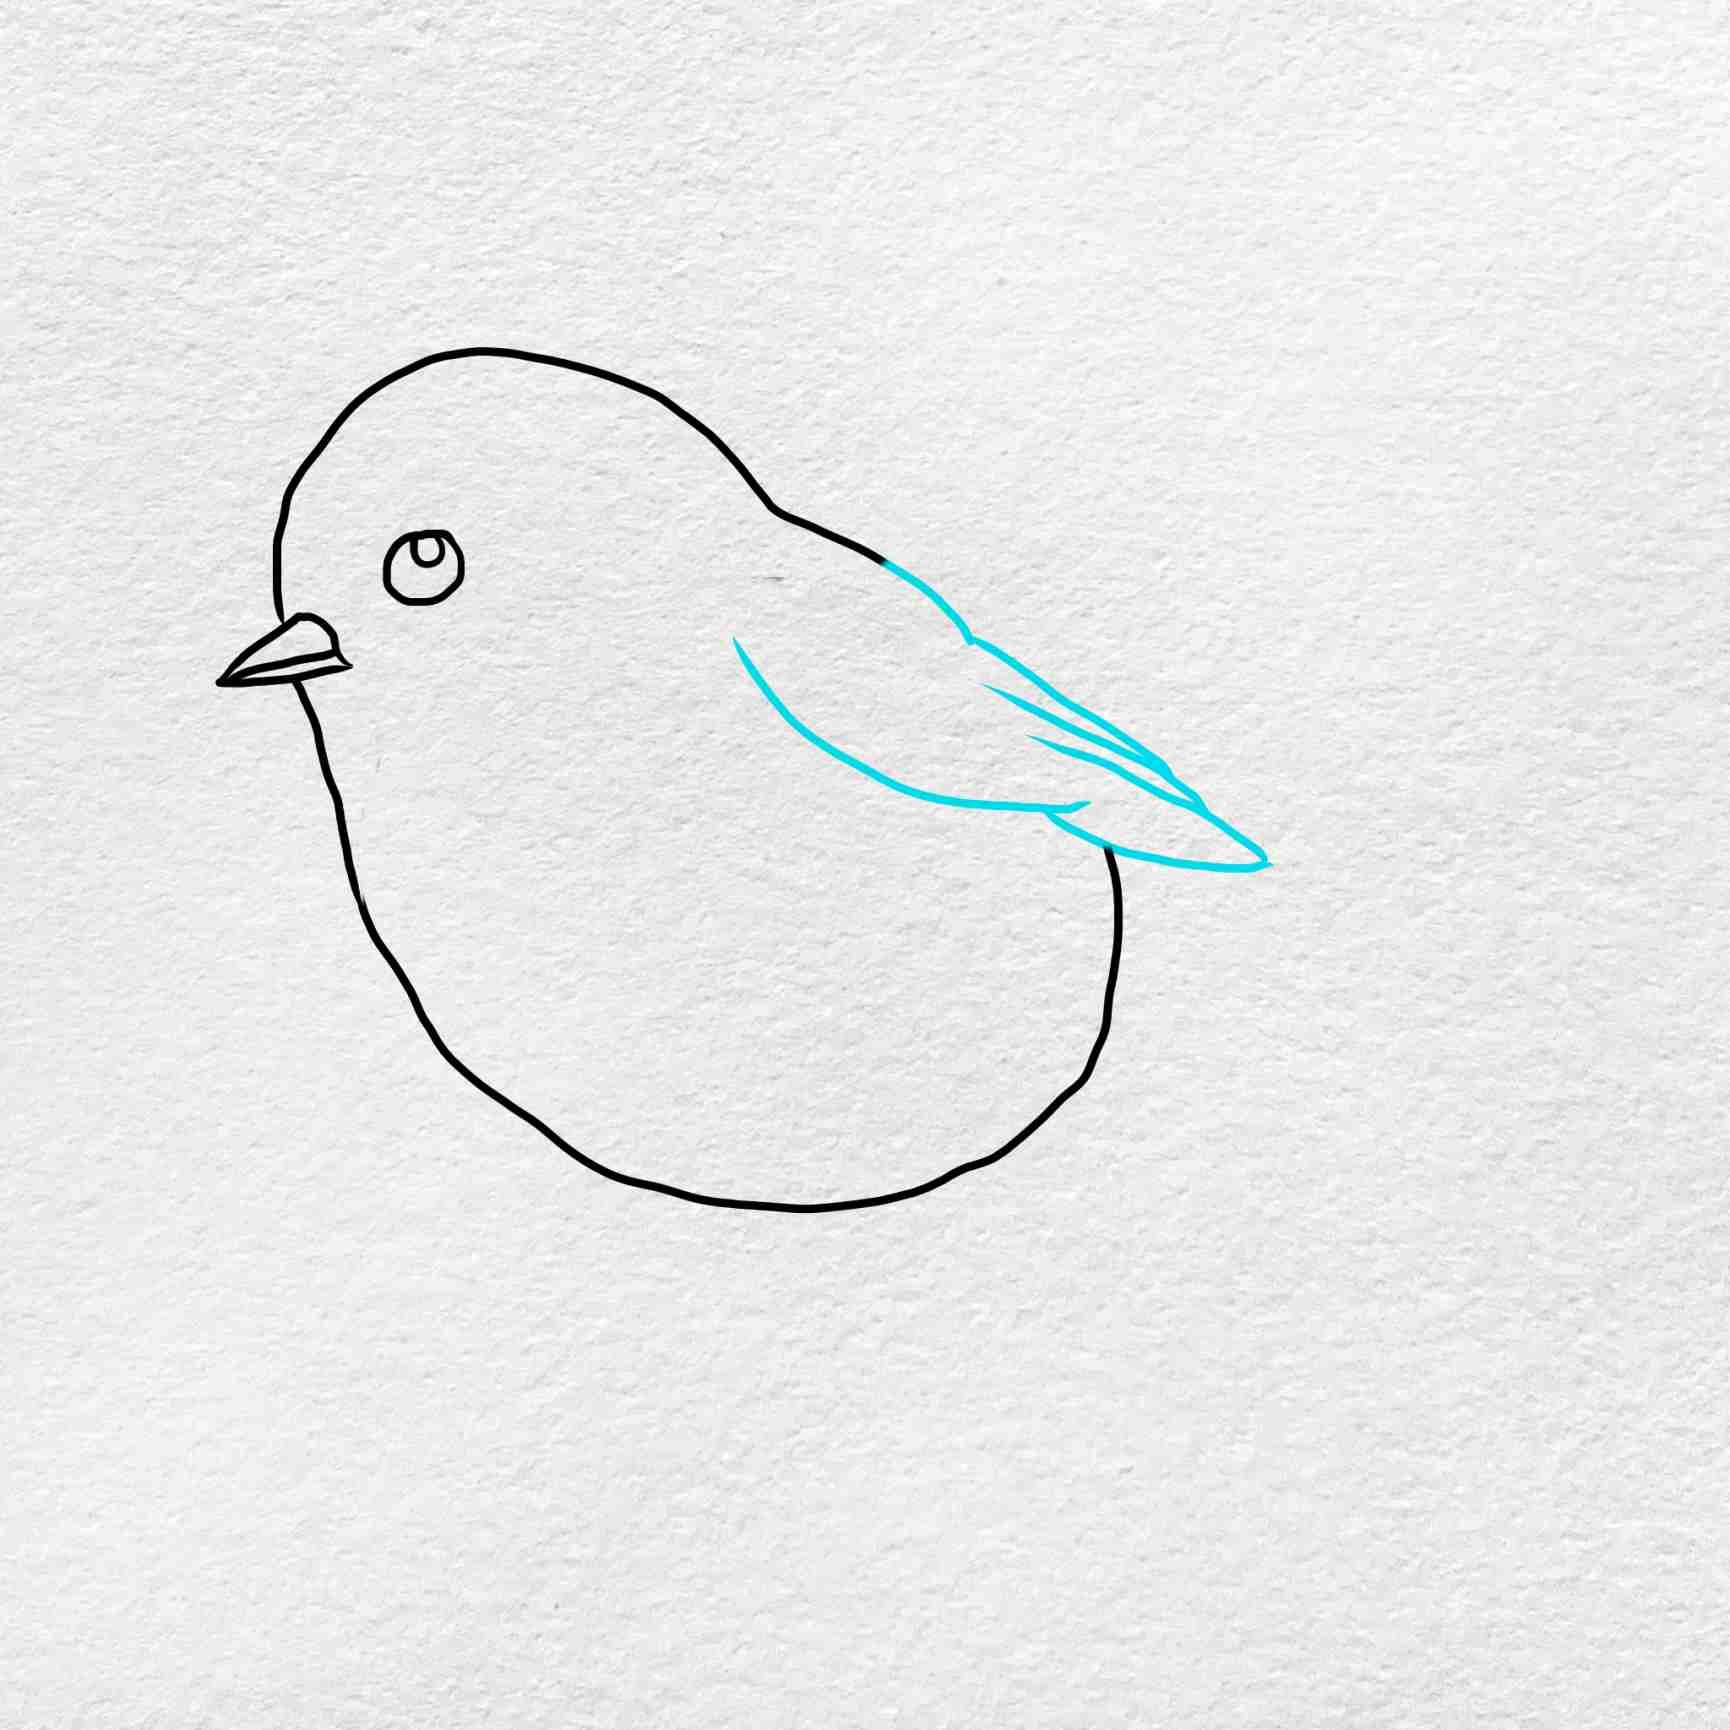 How To Draw Chickadee: Step 3